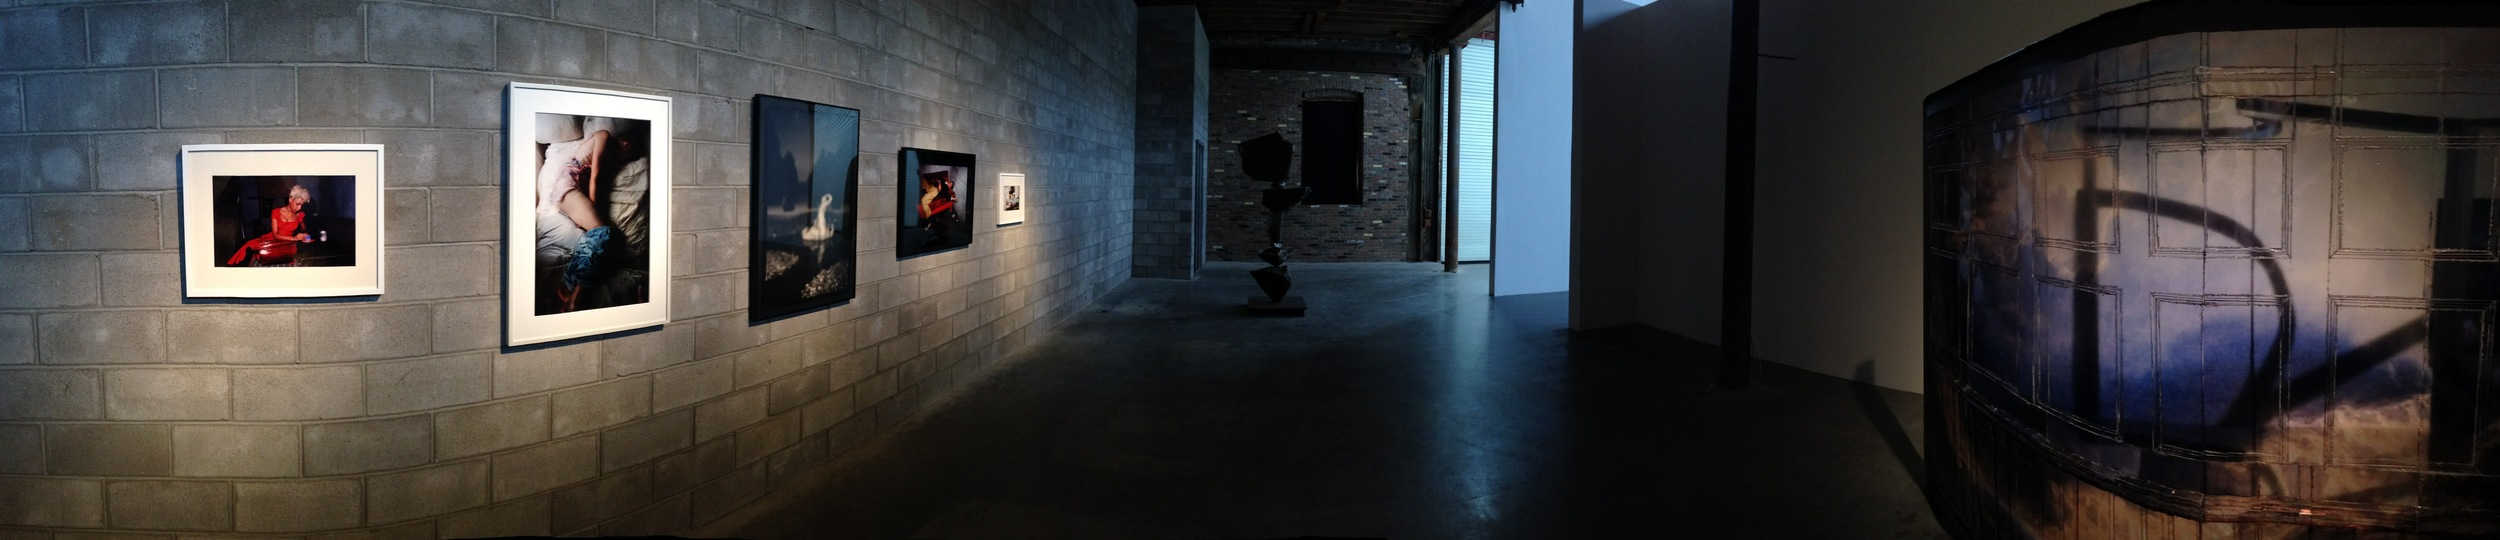 Exhibition Image,  Amor Fati  Photo Credit: Cincala ArtAdvisory